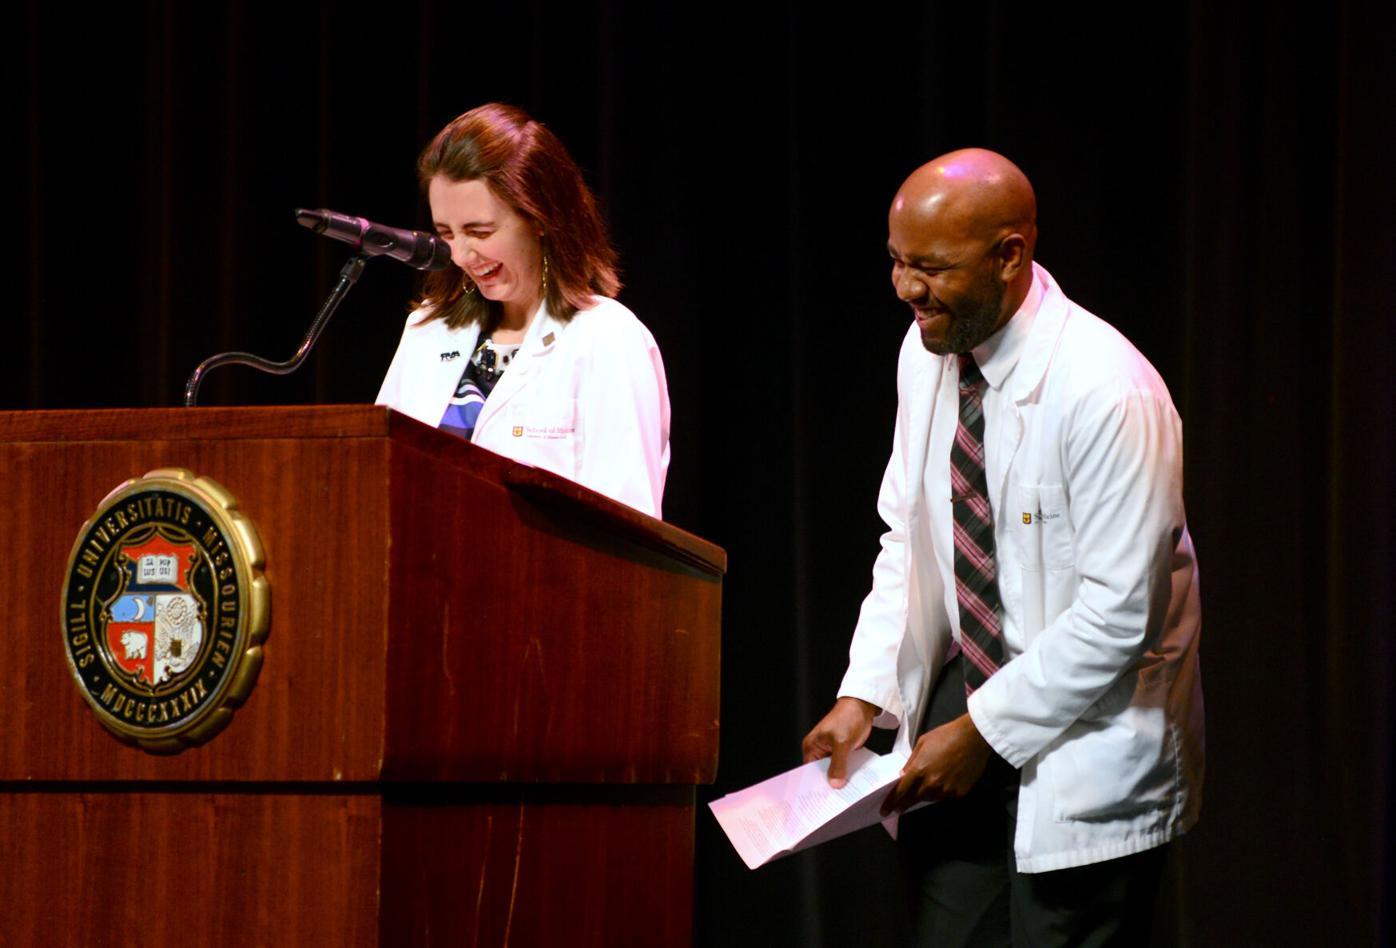 Samantha Unangst and Taylor Brooks address new students